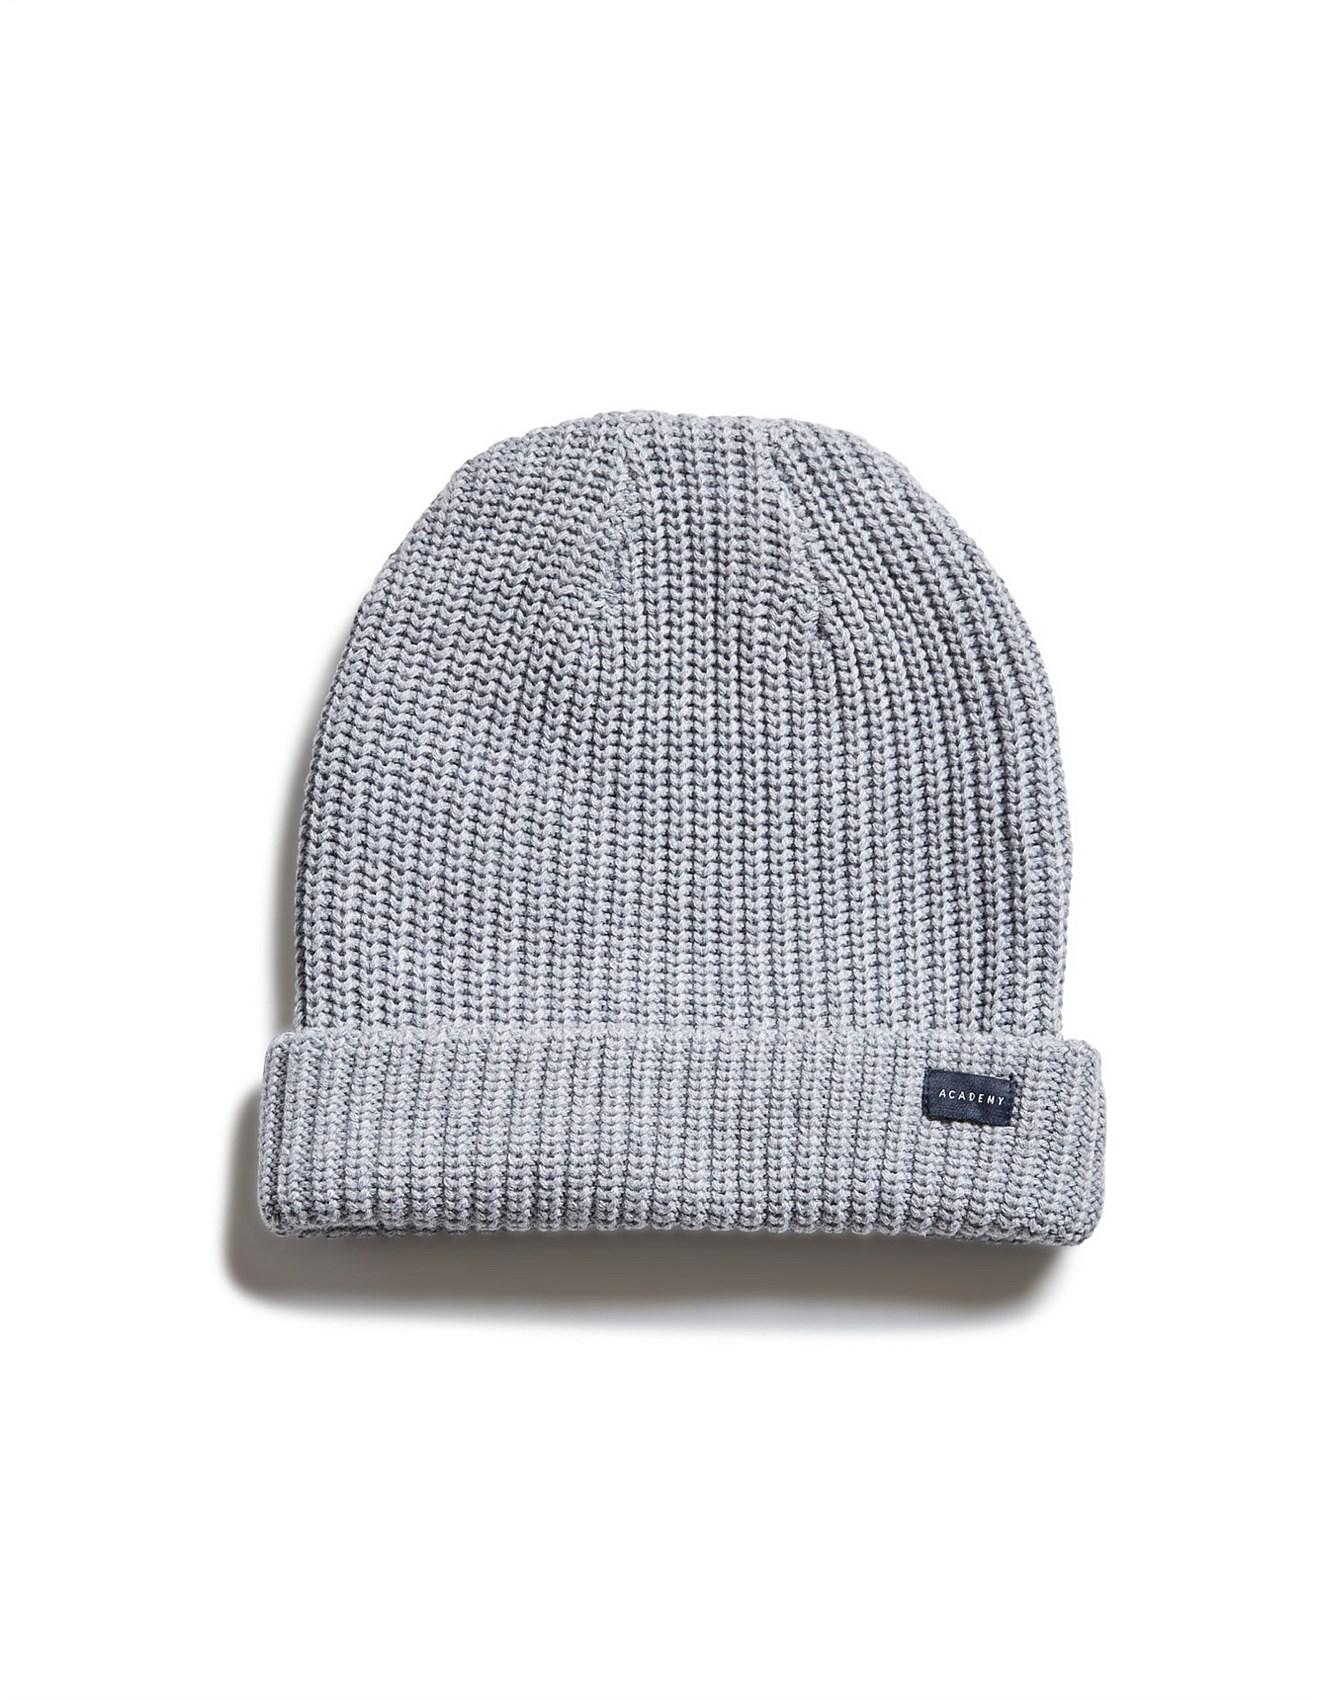 7da318bb11c Men s Hats